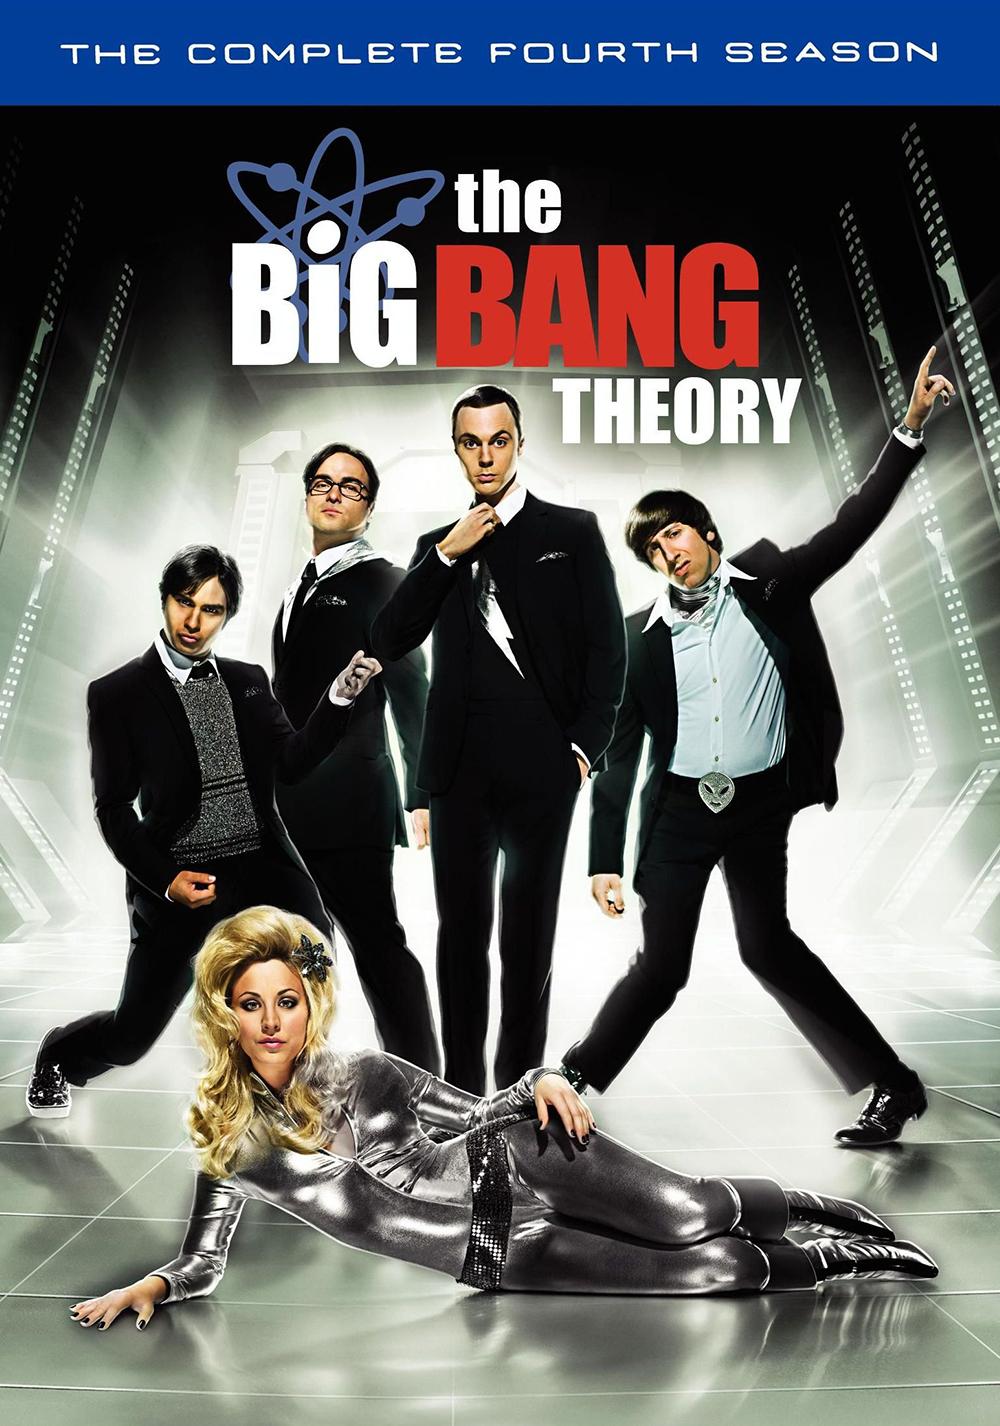 An analysis of the big bang theory